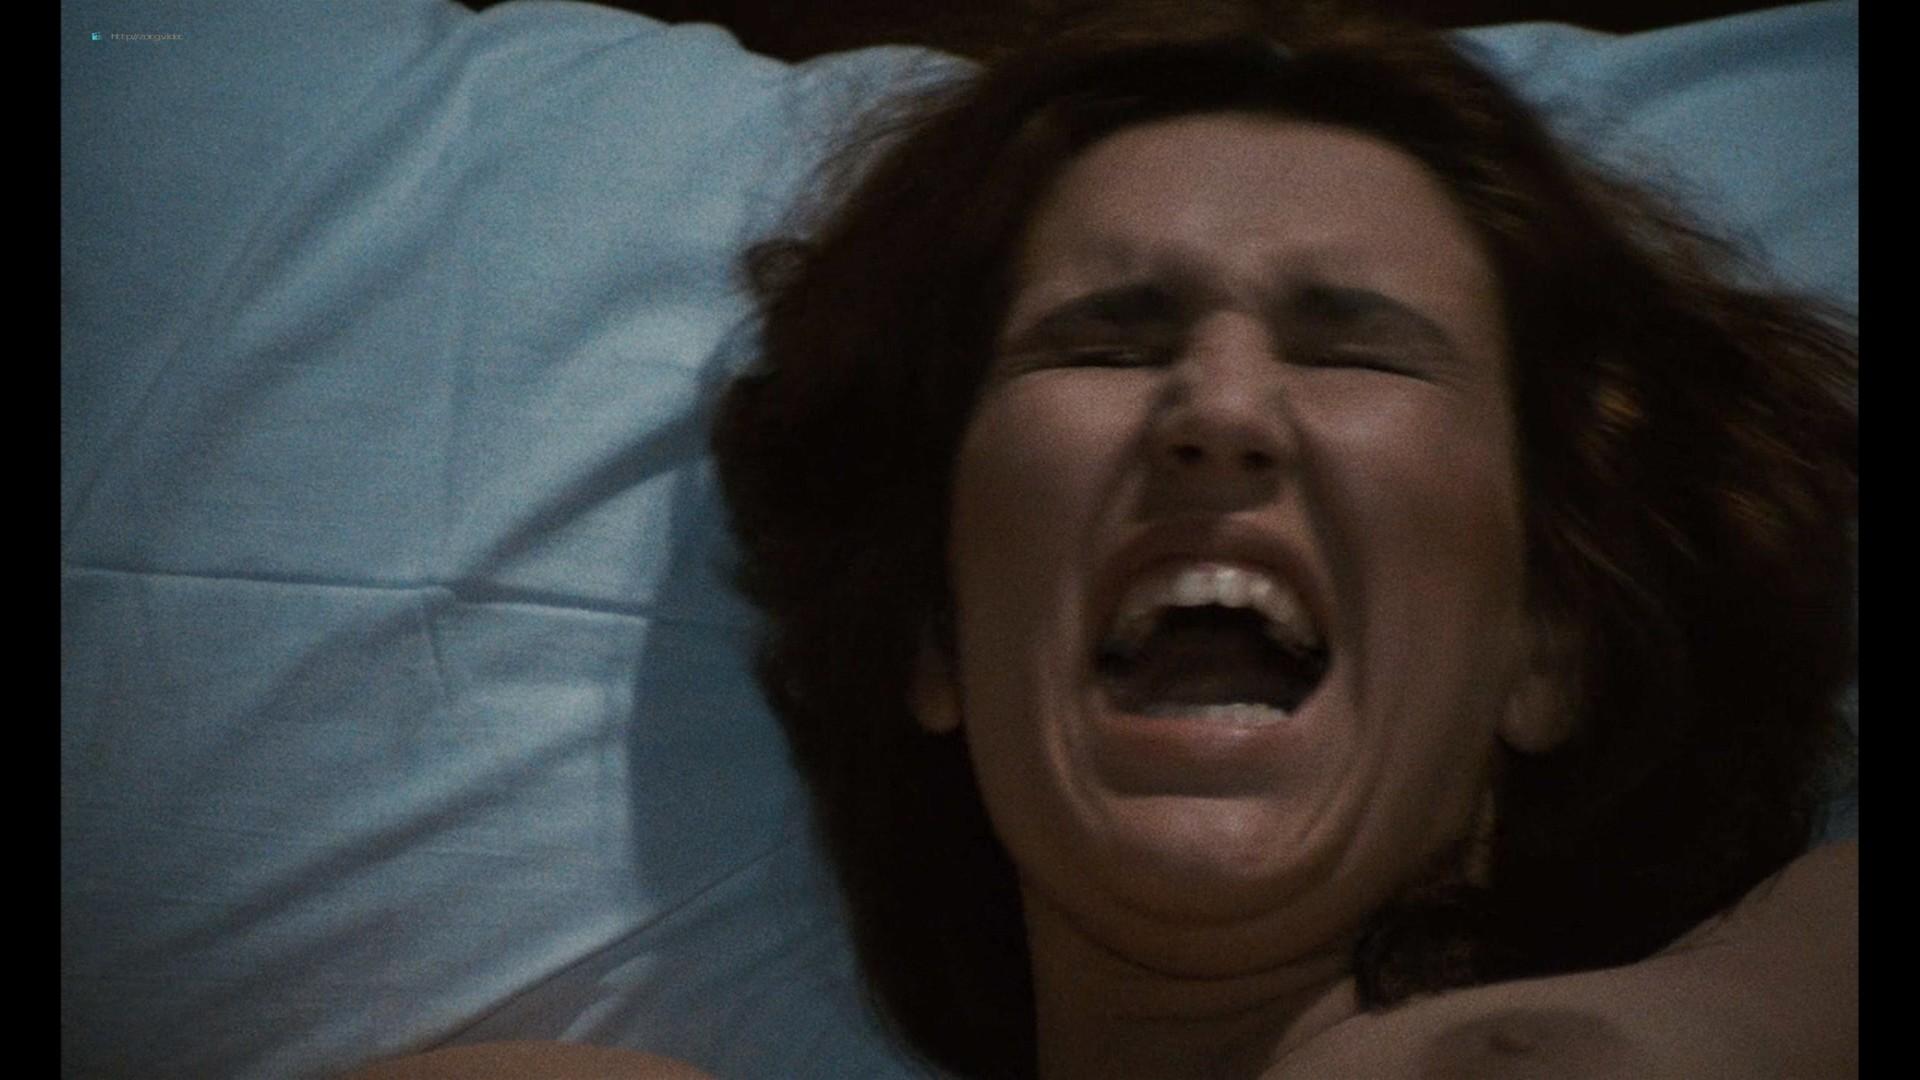 Roxana Nieto nude Leticia Marfil and Pilar Alcón all nude bush topless - Pieces (1982) HD 1080p BluRay (12)